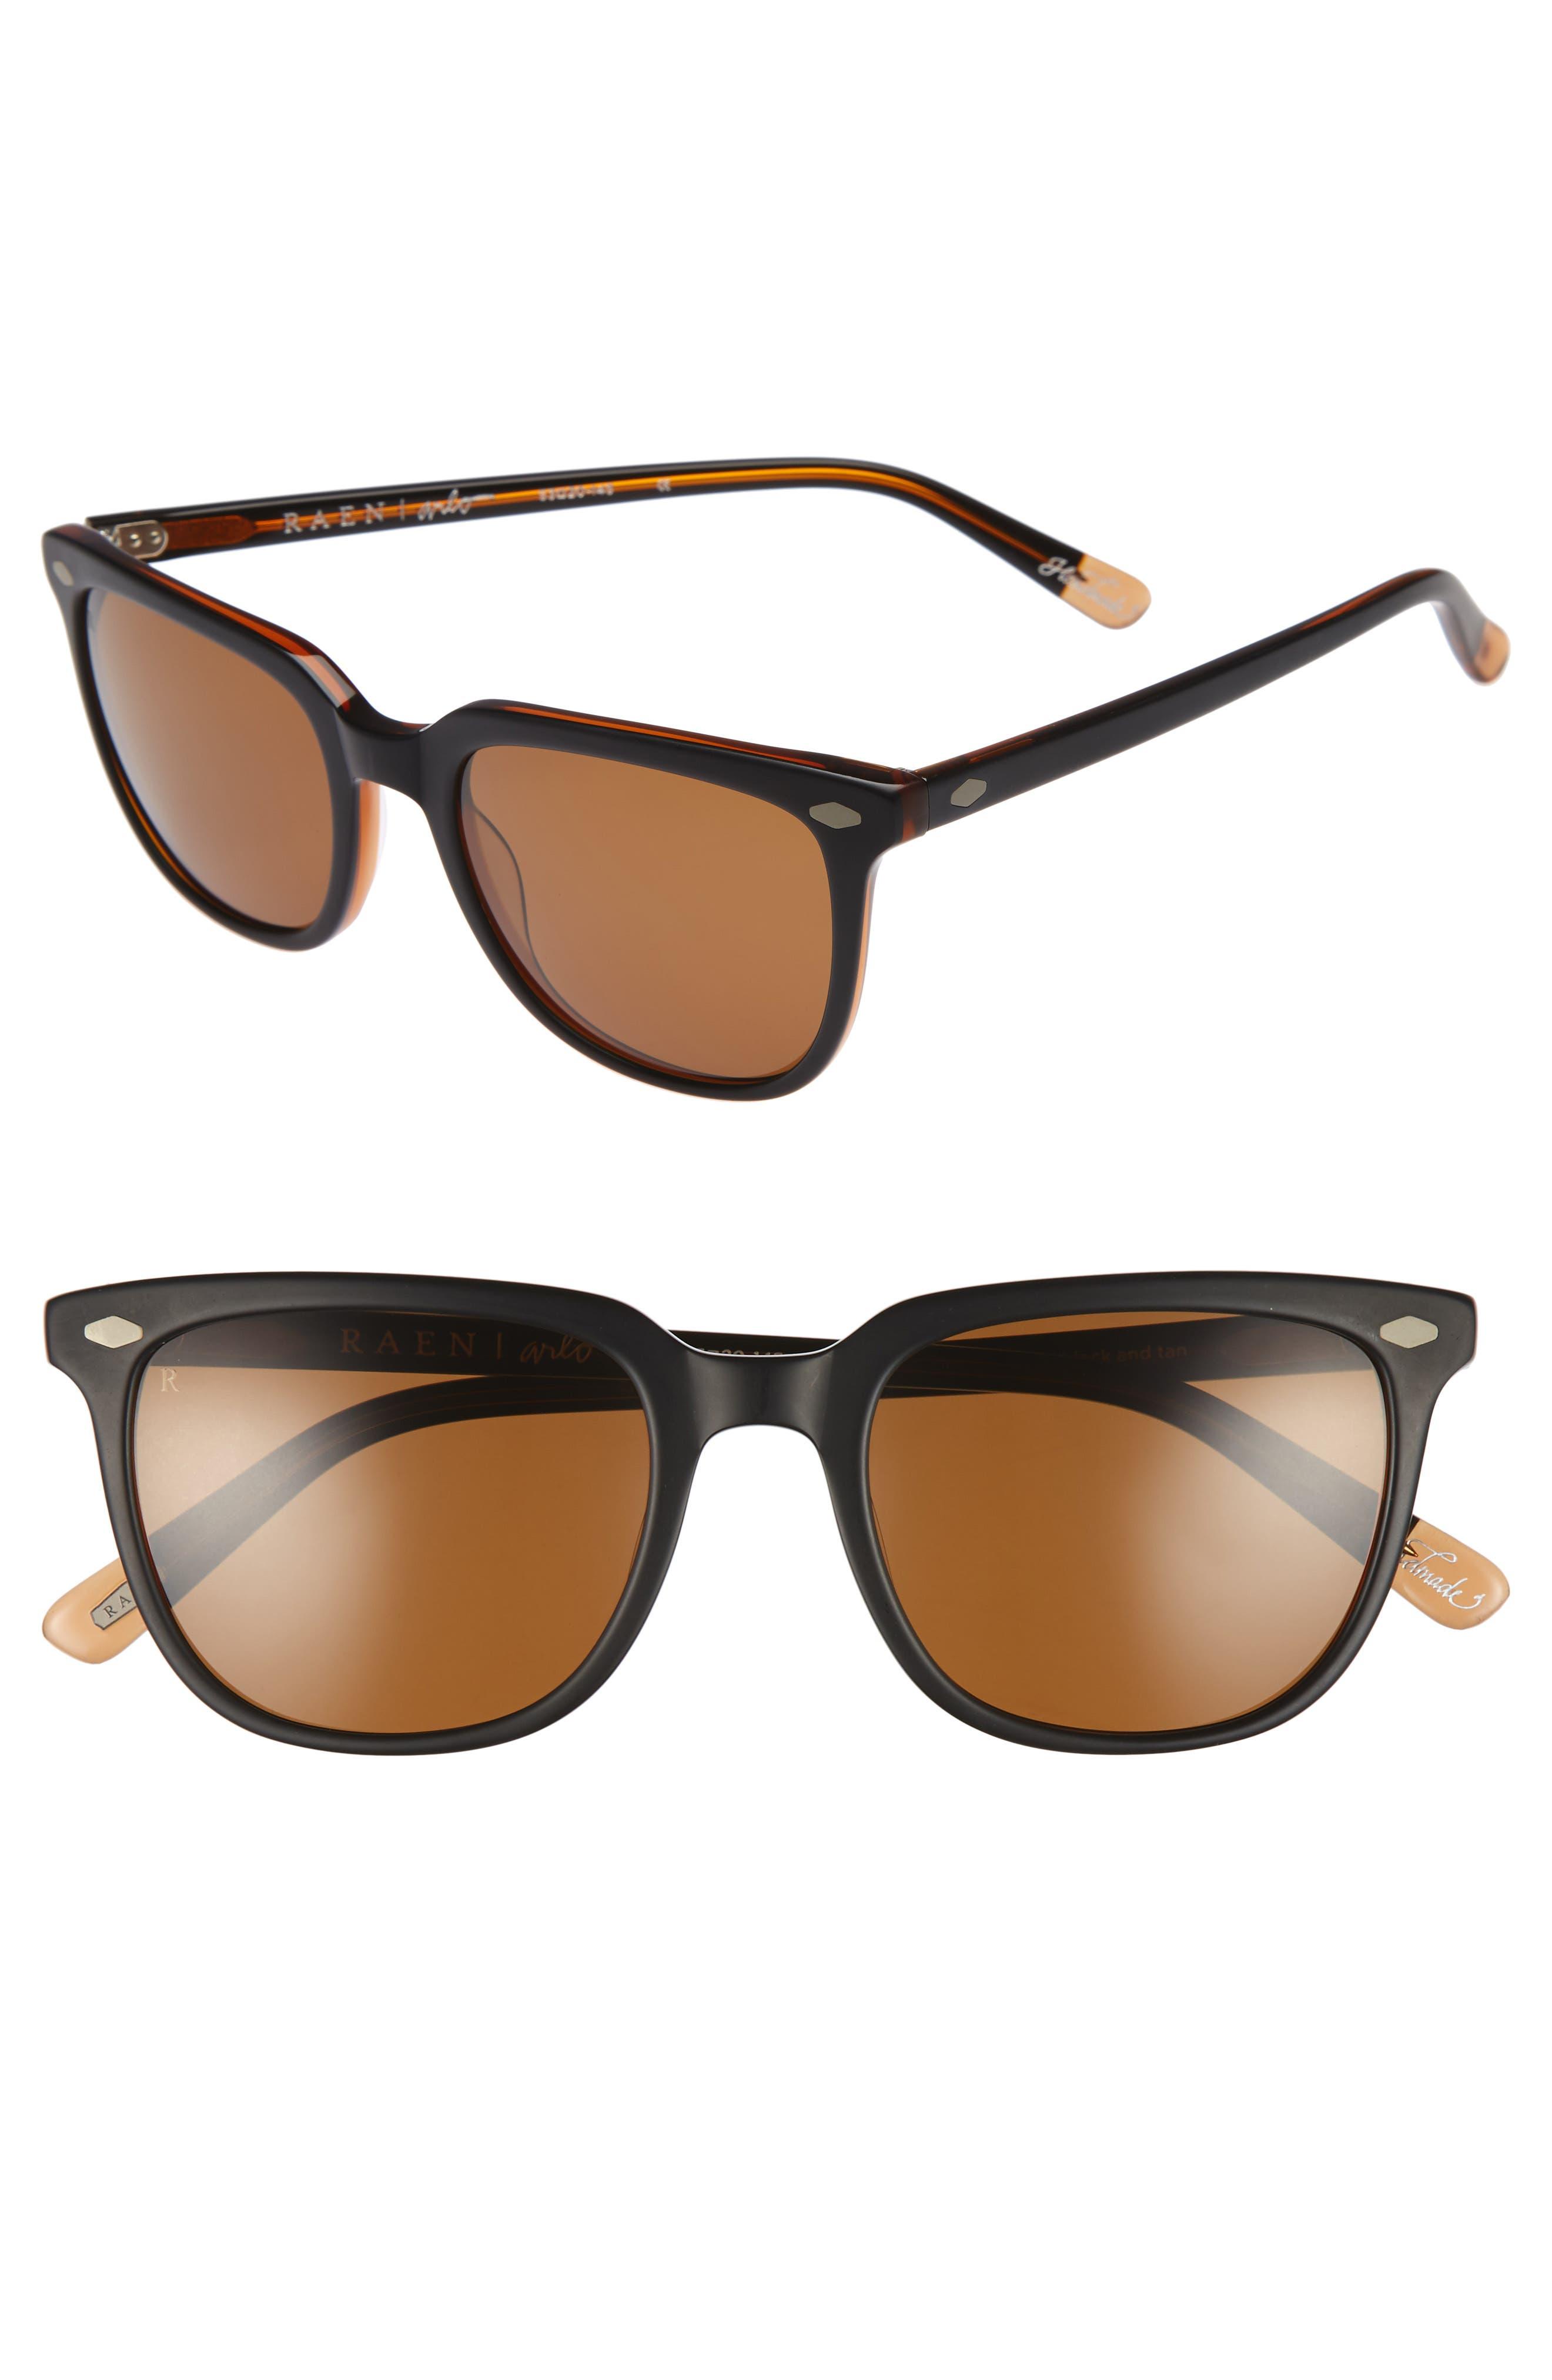 Retro Sunglasses | Vintage Glasses | New Vintage Eyeglasses Mens Raen Arlo 53Mm Polarized Sunglasses - $135.00 AT vintagedancer.com